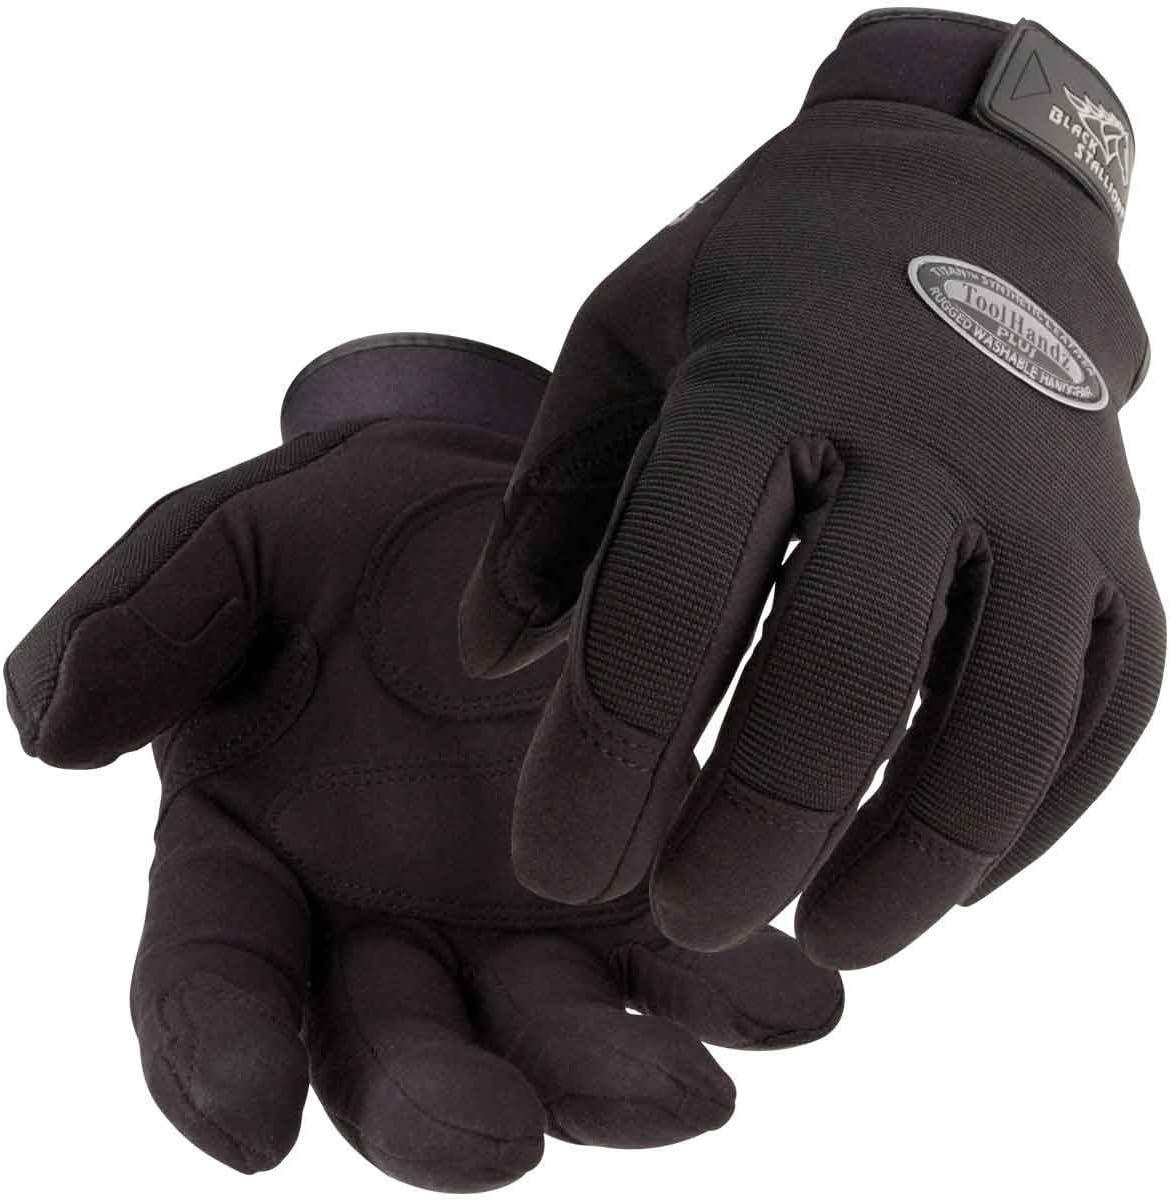 Attention brand Black Milwaukee Mall STALLION Tool Handz Plus - Gloves Reinforced Snug-Fitting